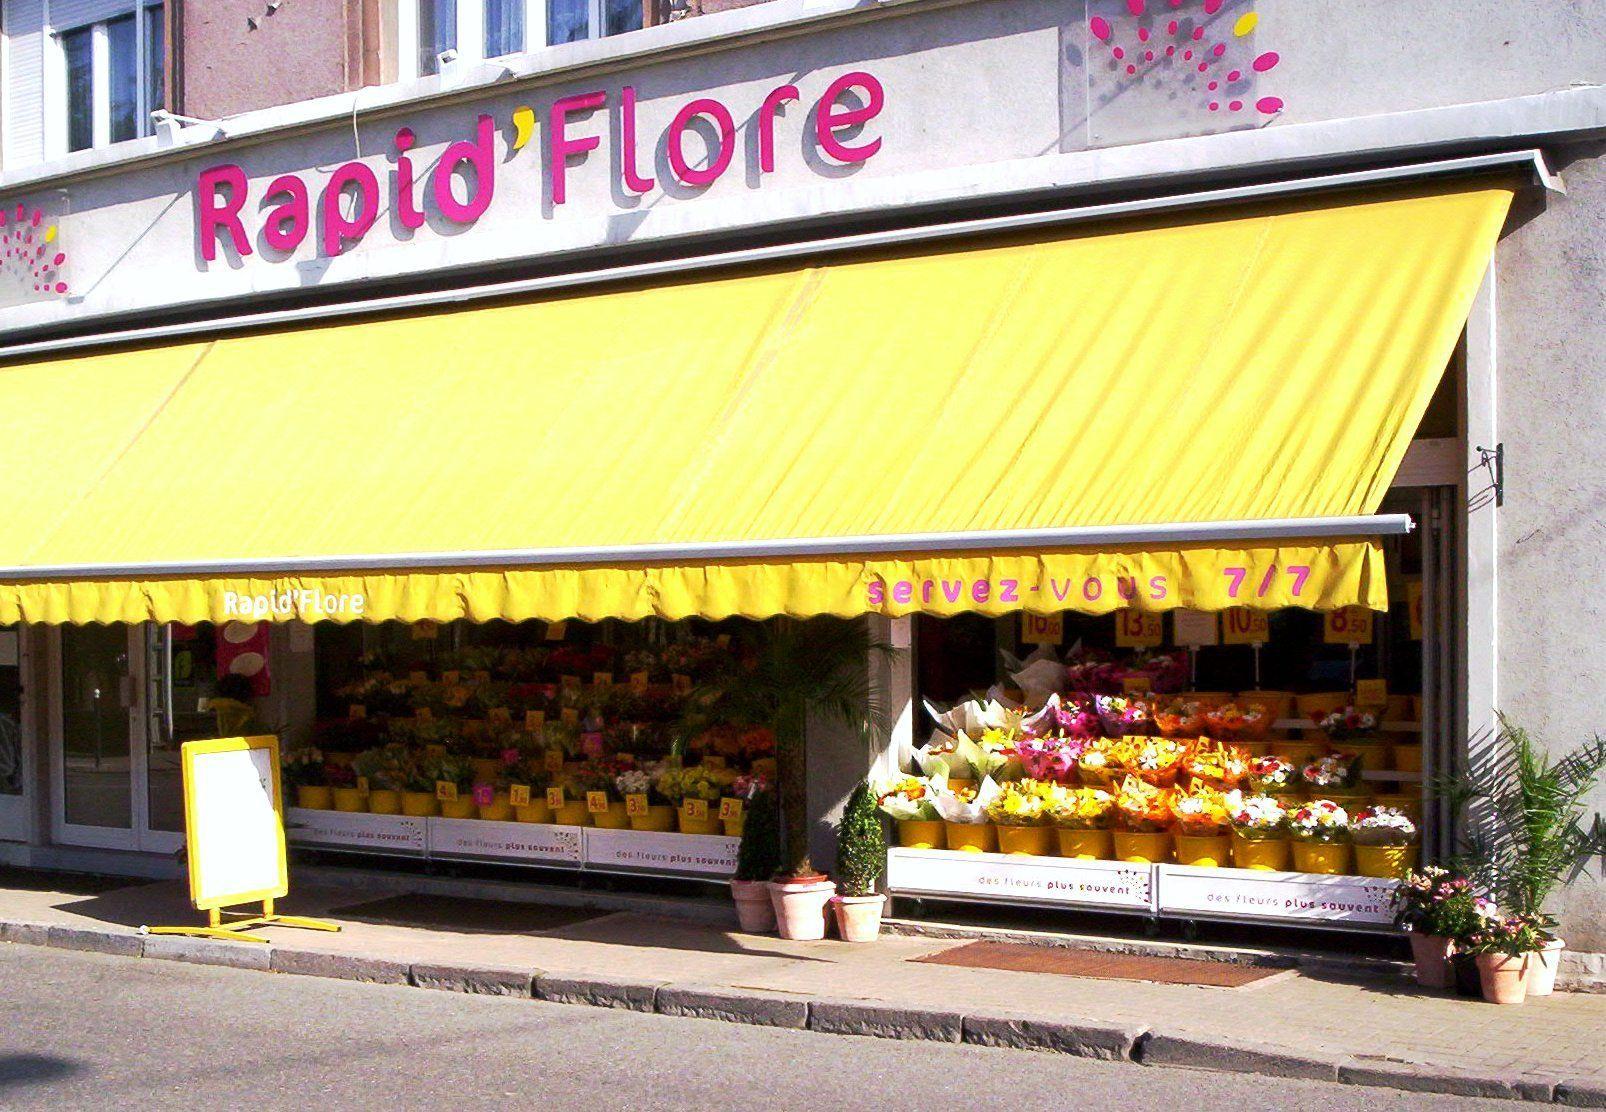 fleuriste rapid 39 flore lorraine tourisme. Black Bedroom Furniture Sets. Home Design Ideas